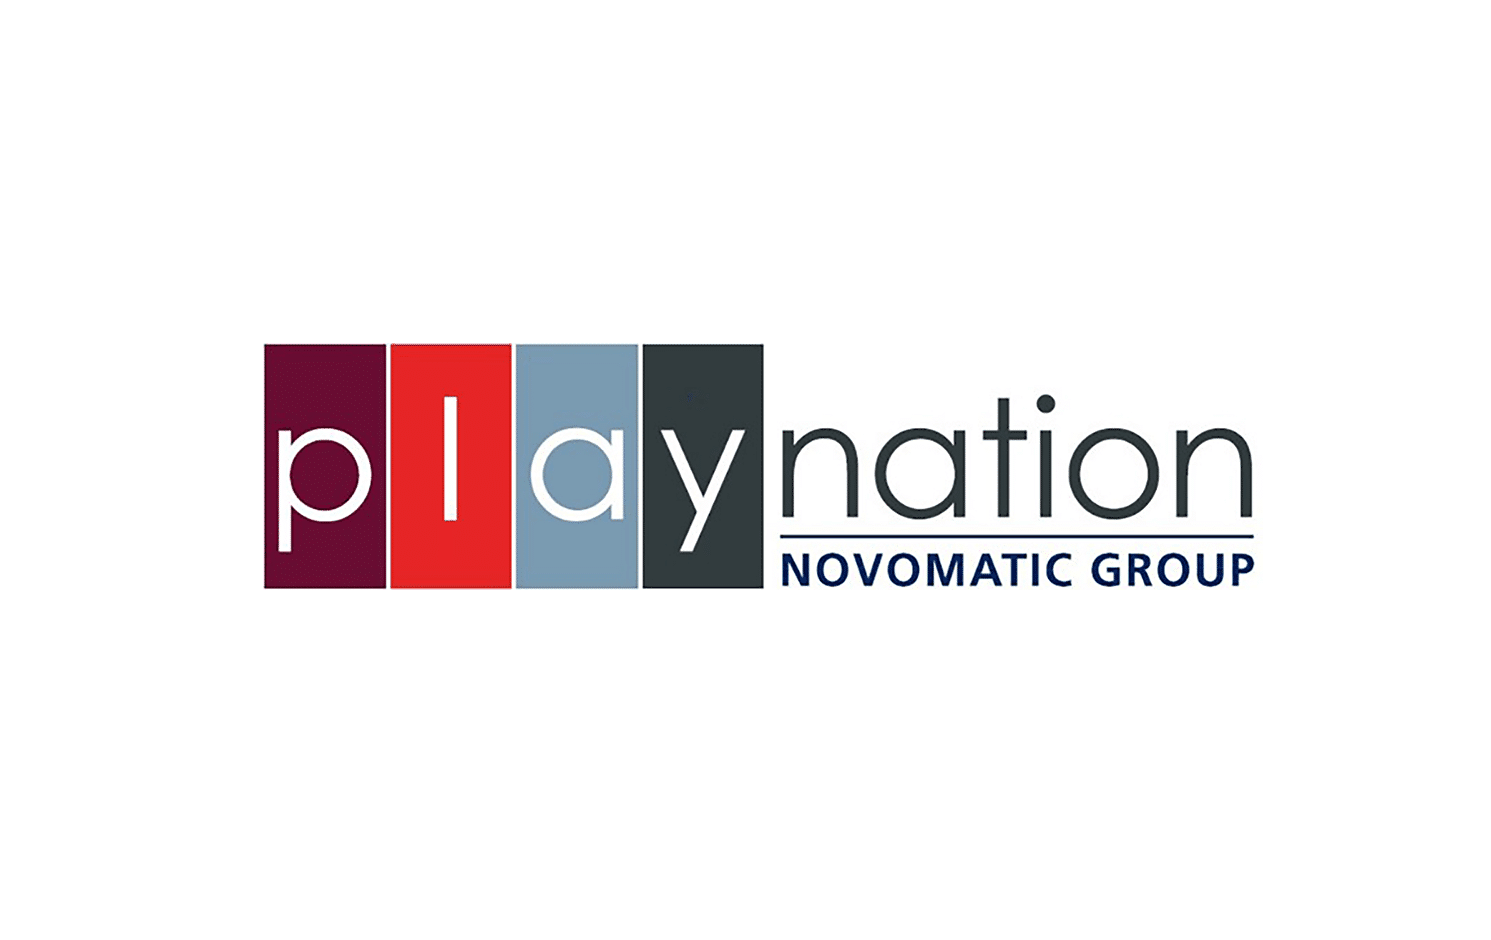 Playnation Case Study